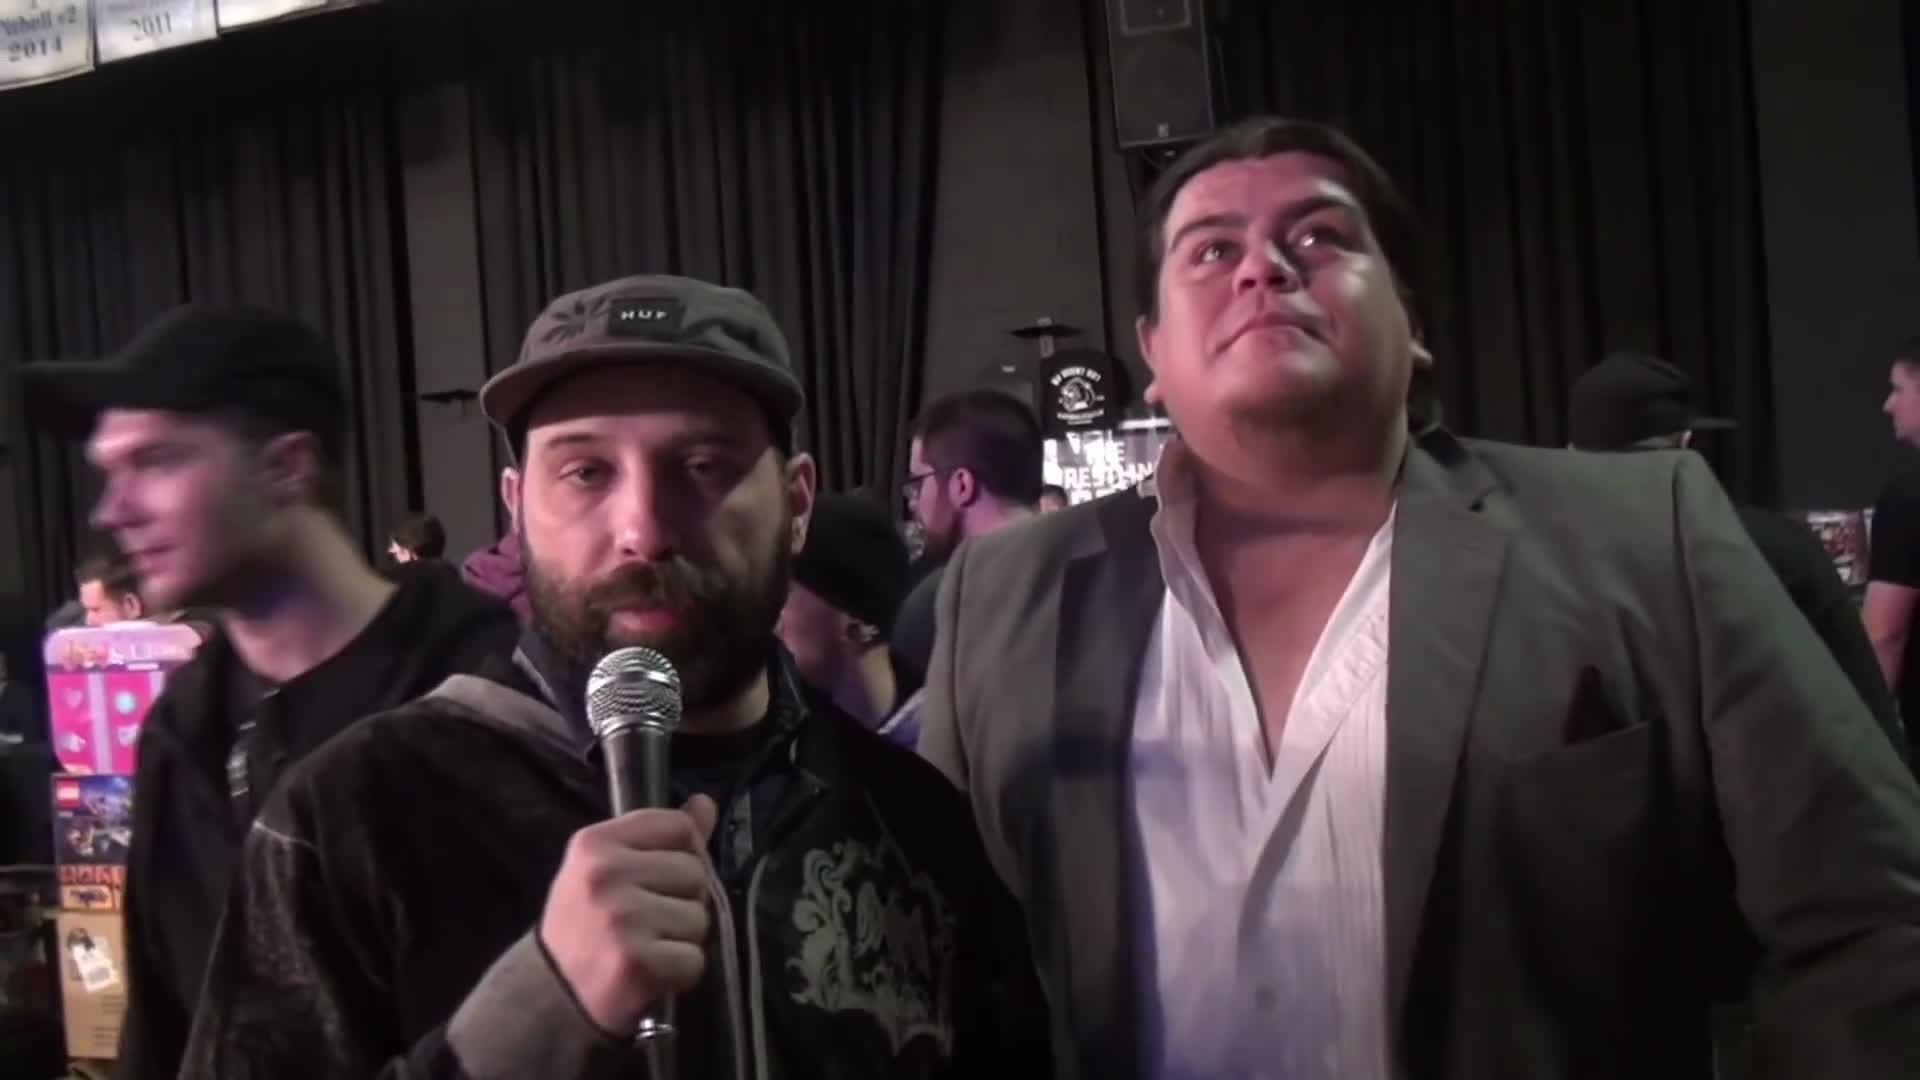 Alberto Del Rio, Film & Animation, Interview, Philadelphia, RAW, Ricardo Rodriguez, Royal Rumble, Super Bowl, WWE, paypereview wrestling, Looking around GIFs